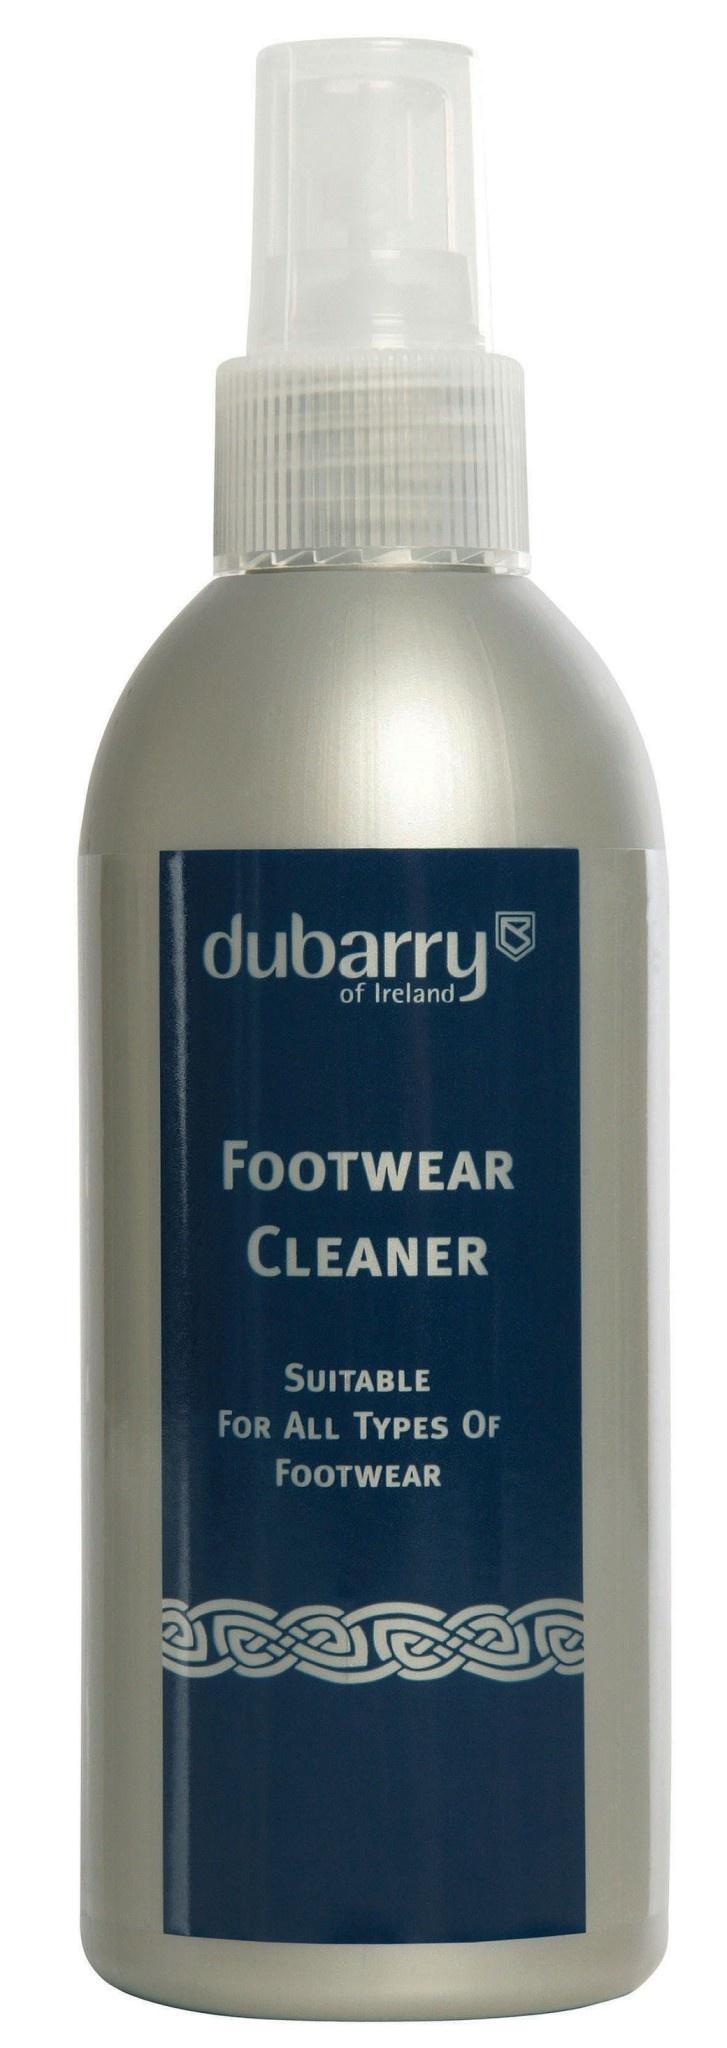 Dubarry Cleaner-1